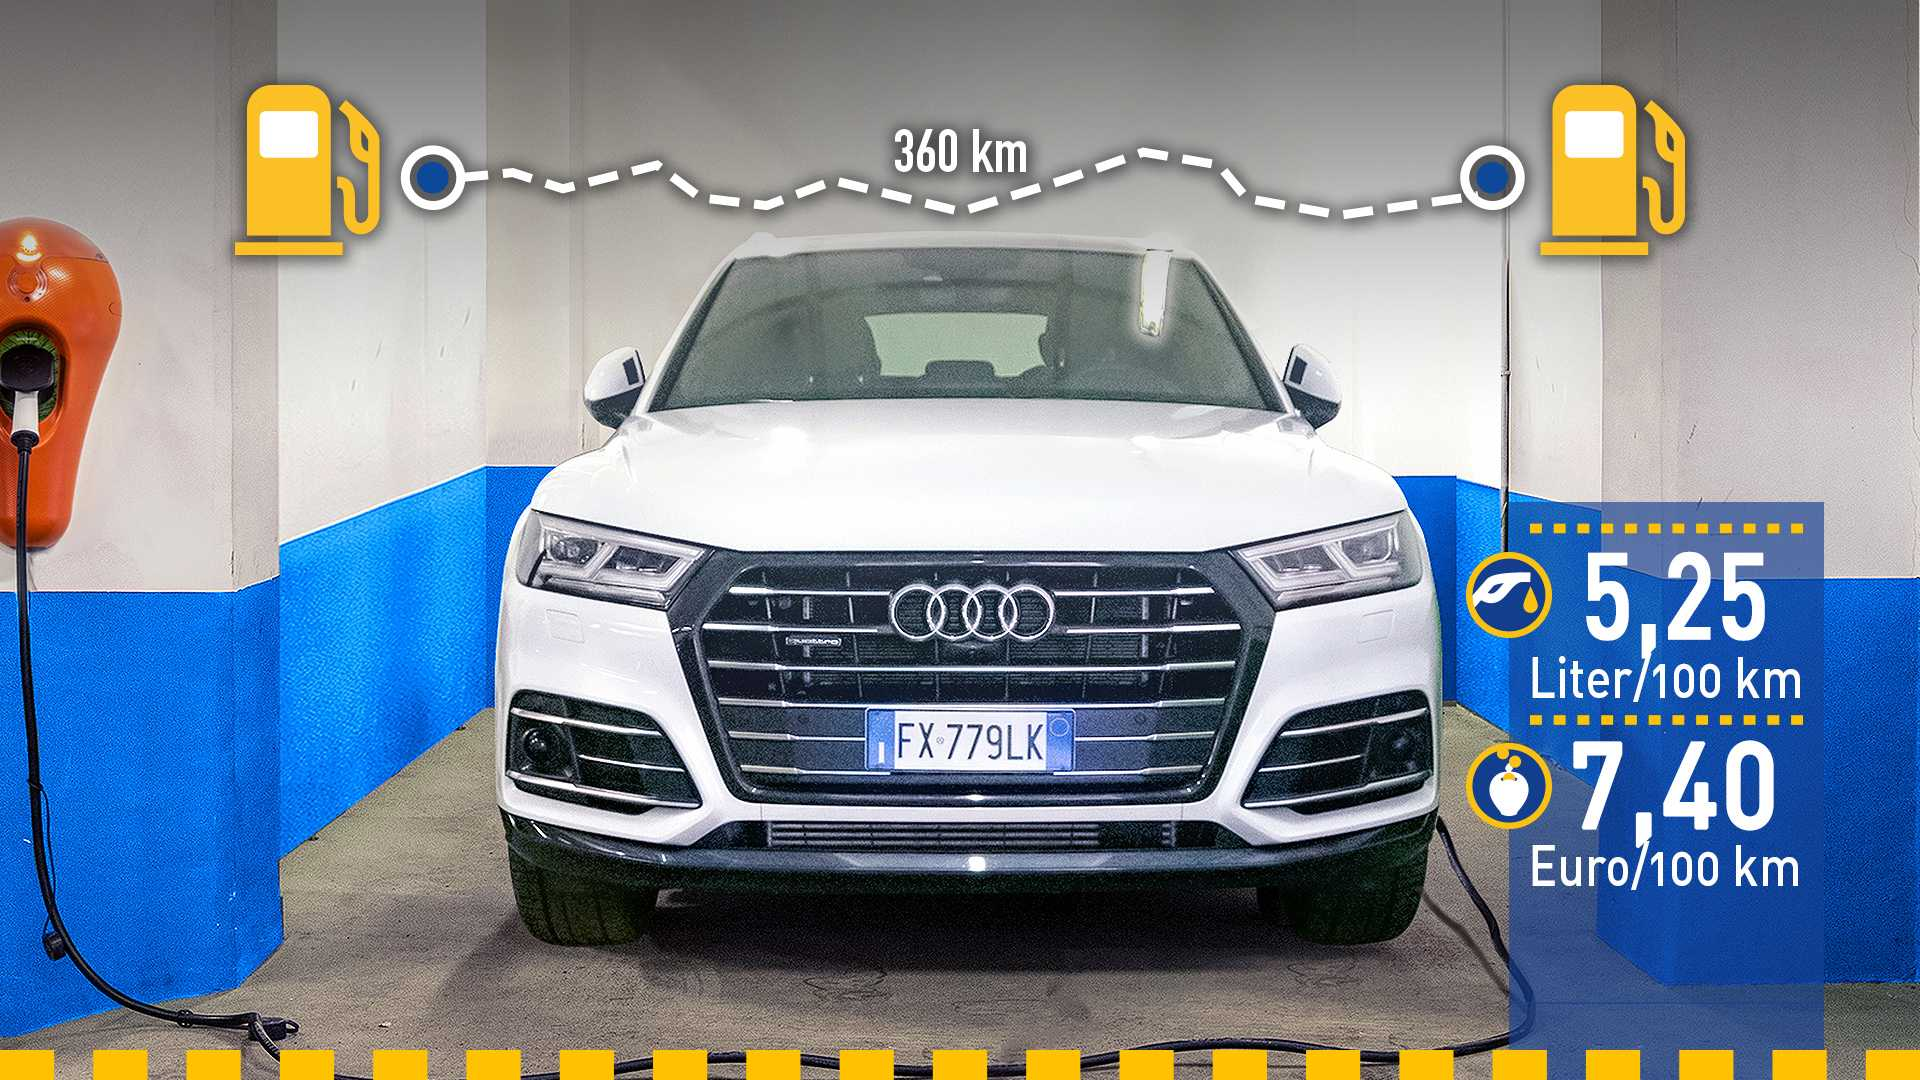 Tatsächlicher Verbrauch: Audi Q5 55 TFSI e quattro im Test